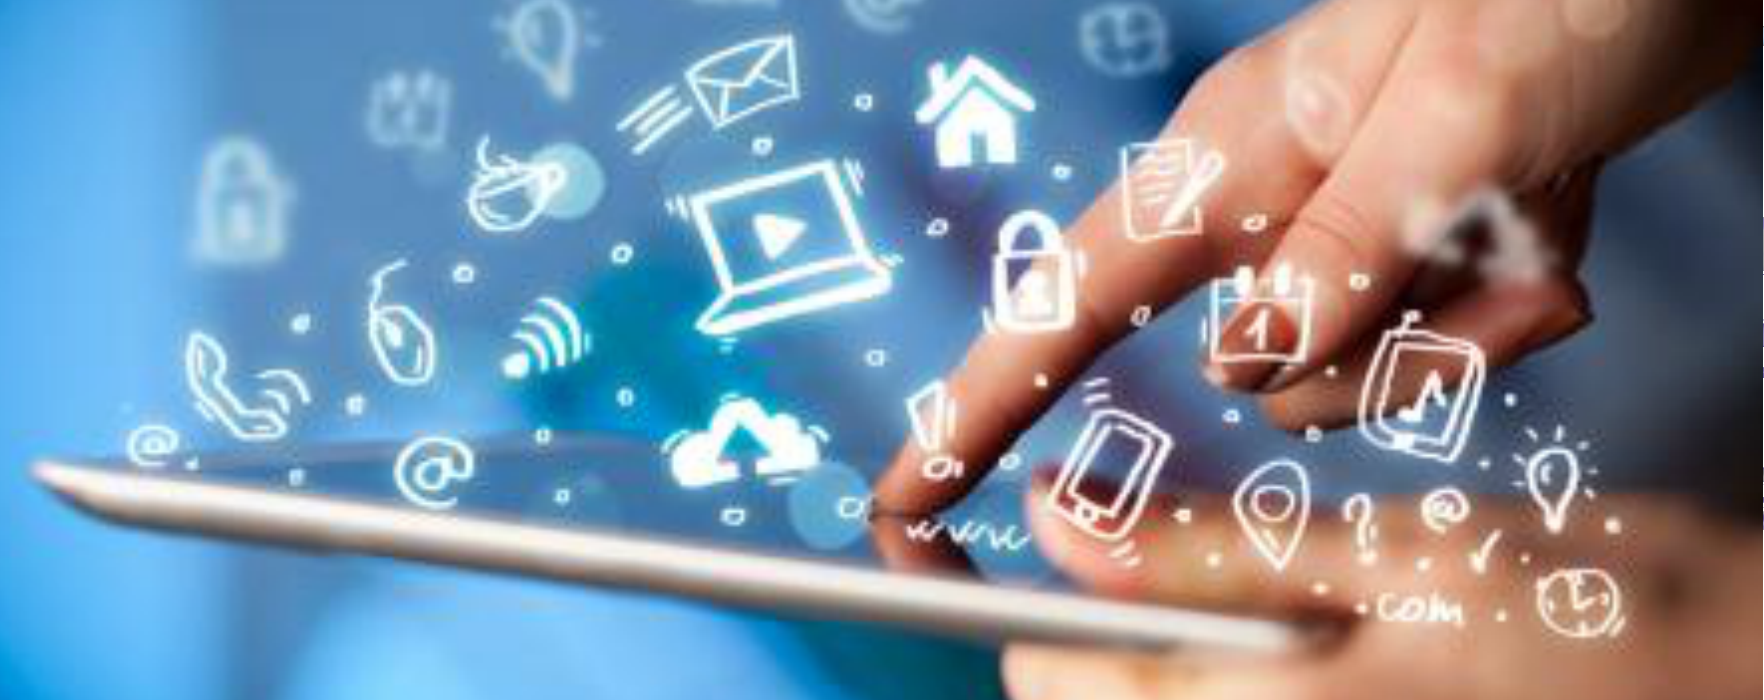 article template - digital enterprise